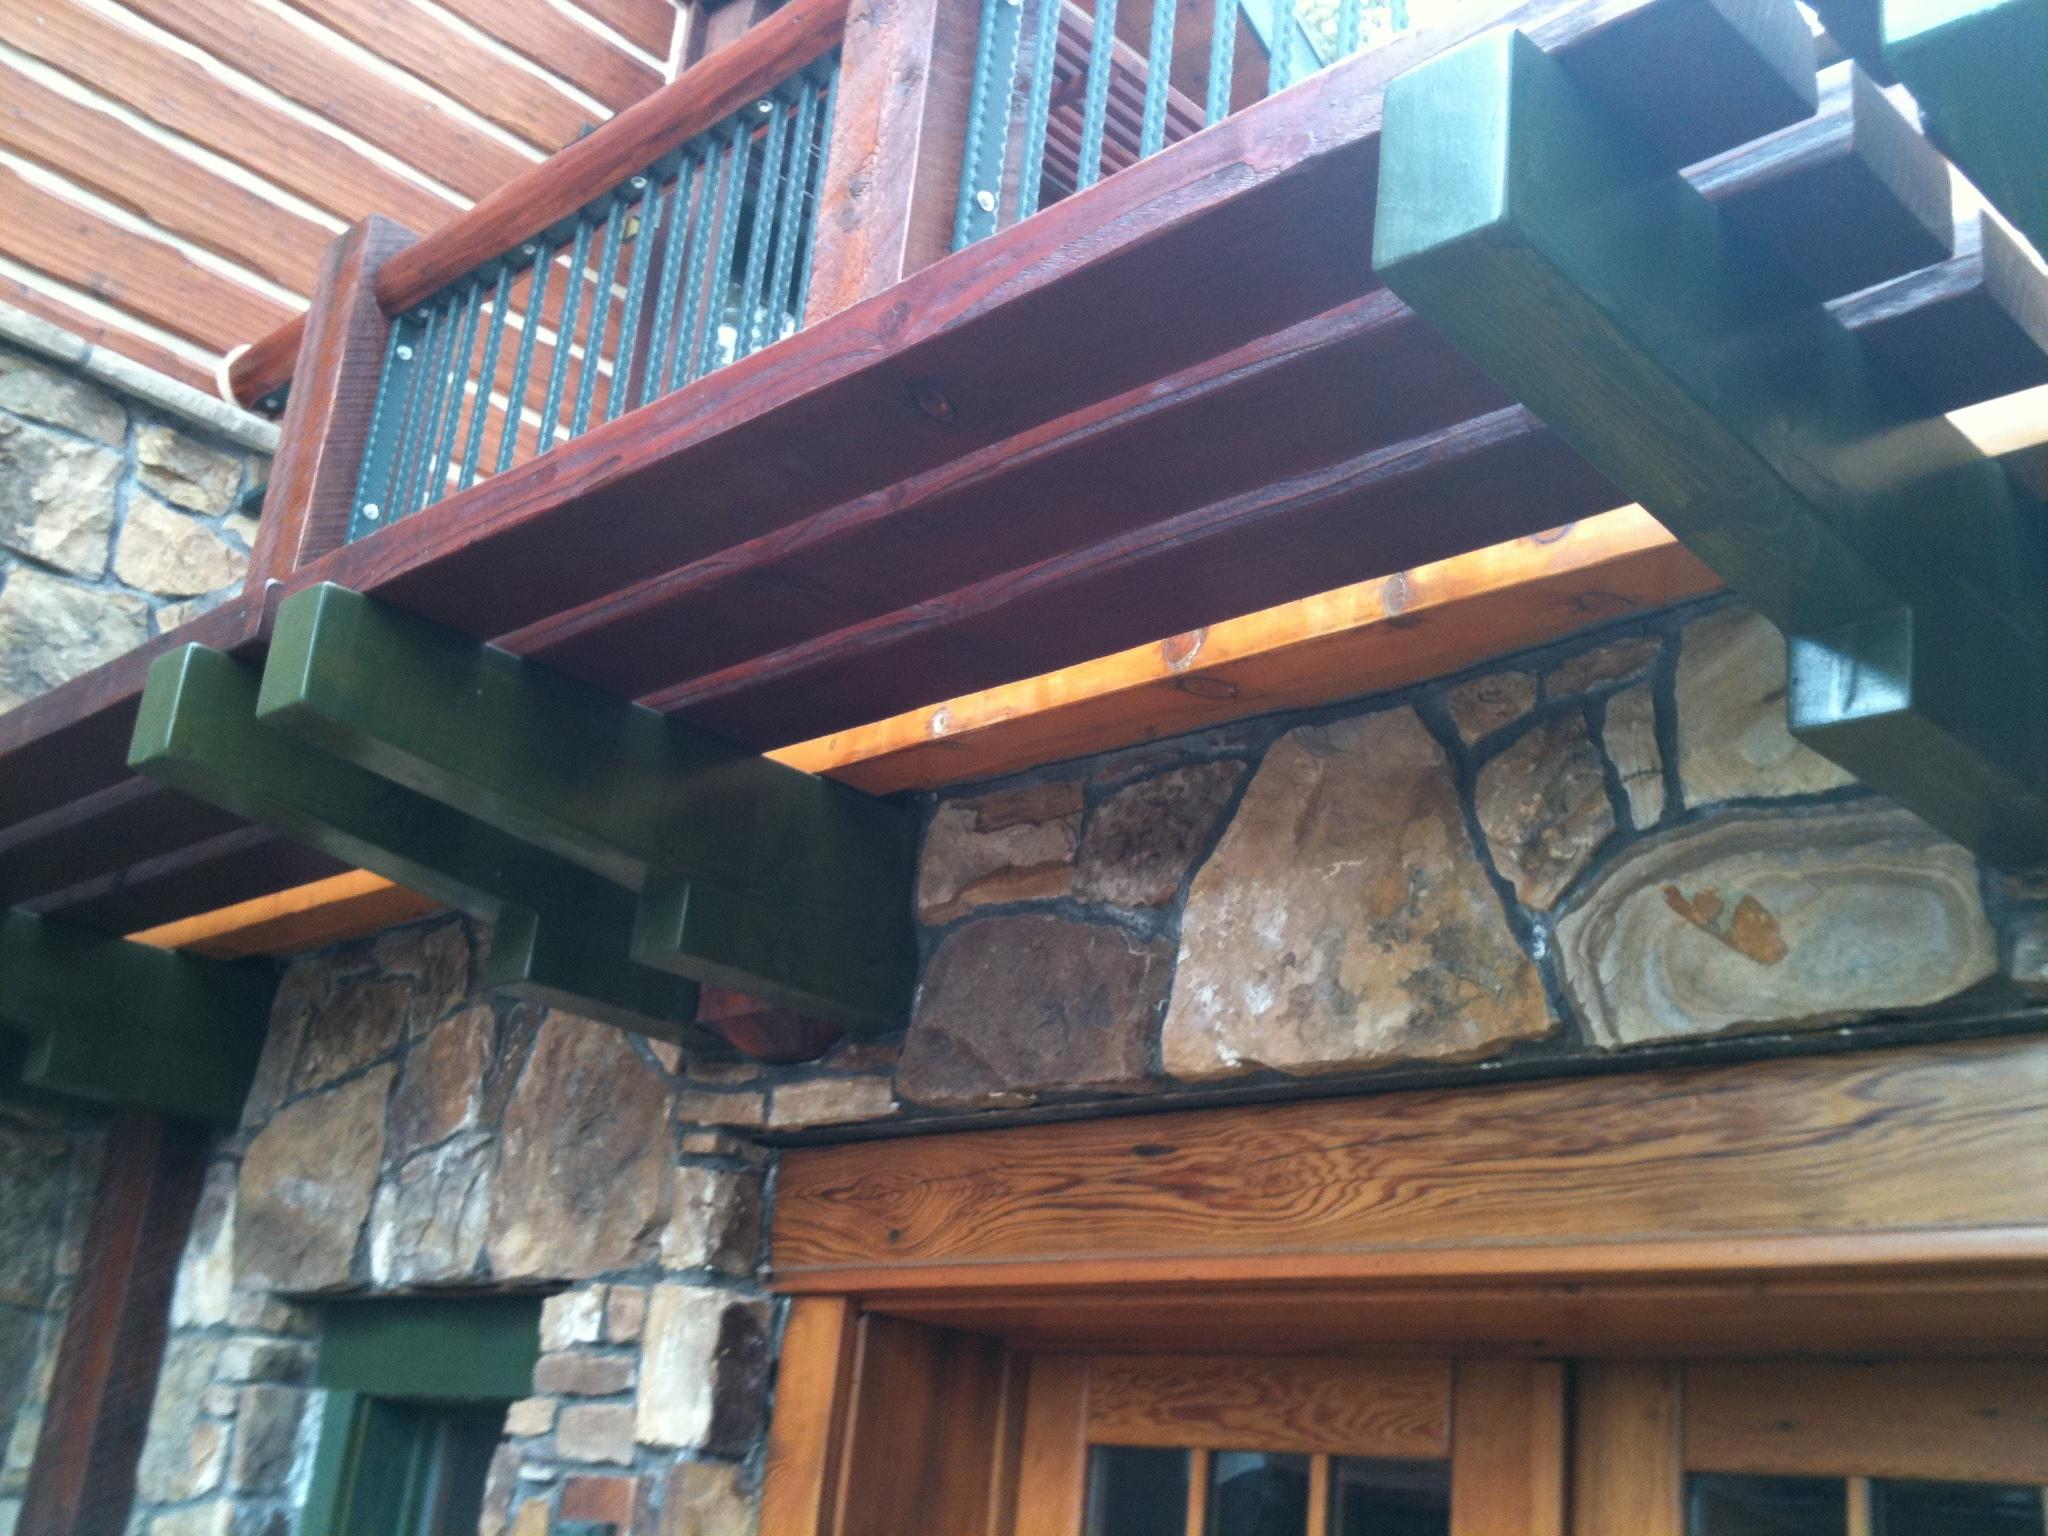 diy exterior wood stains download wooden workshop bench plans